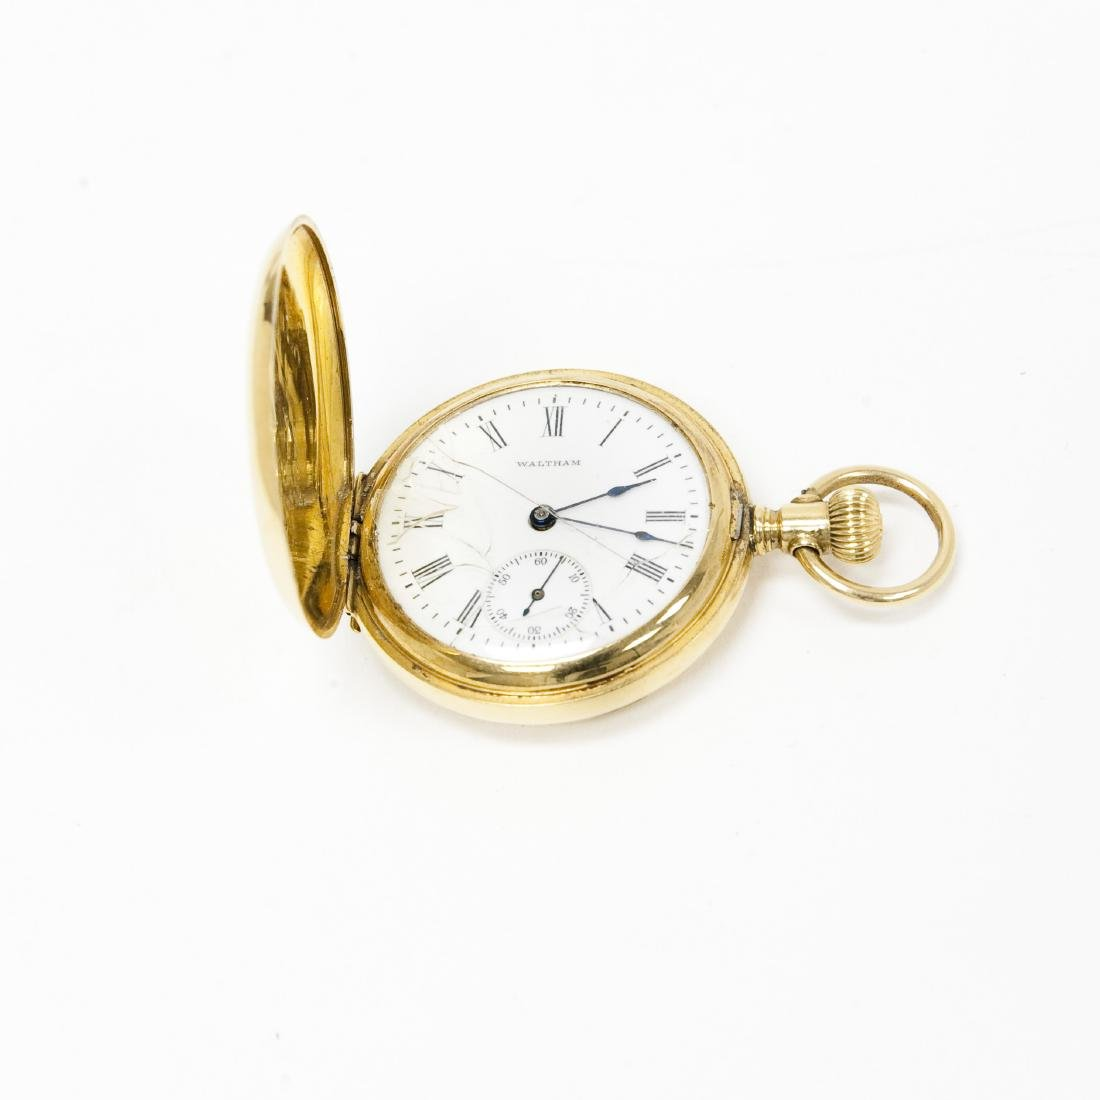 Waltham 18K Gold Hunter Case Watch.